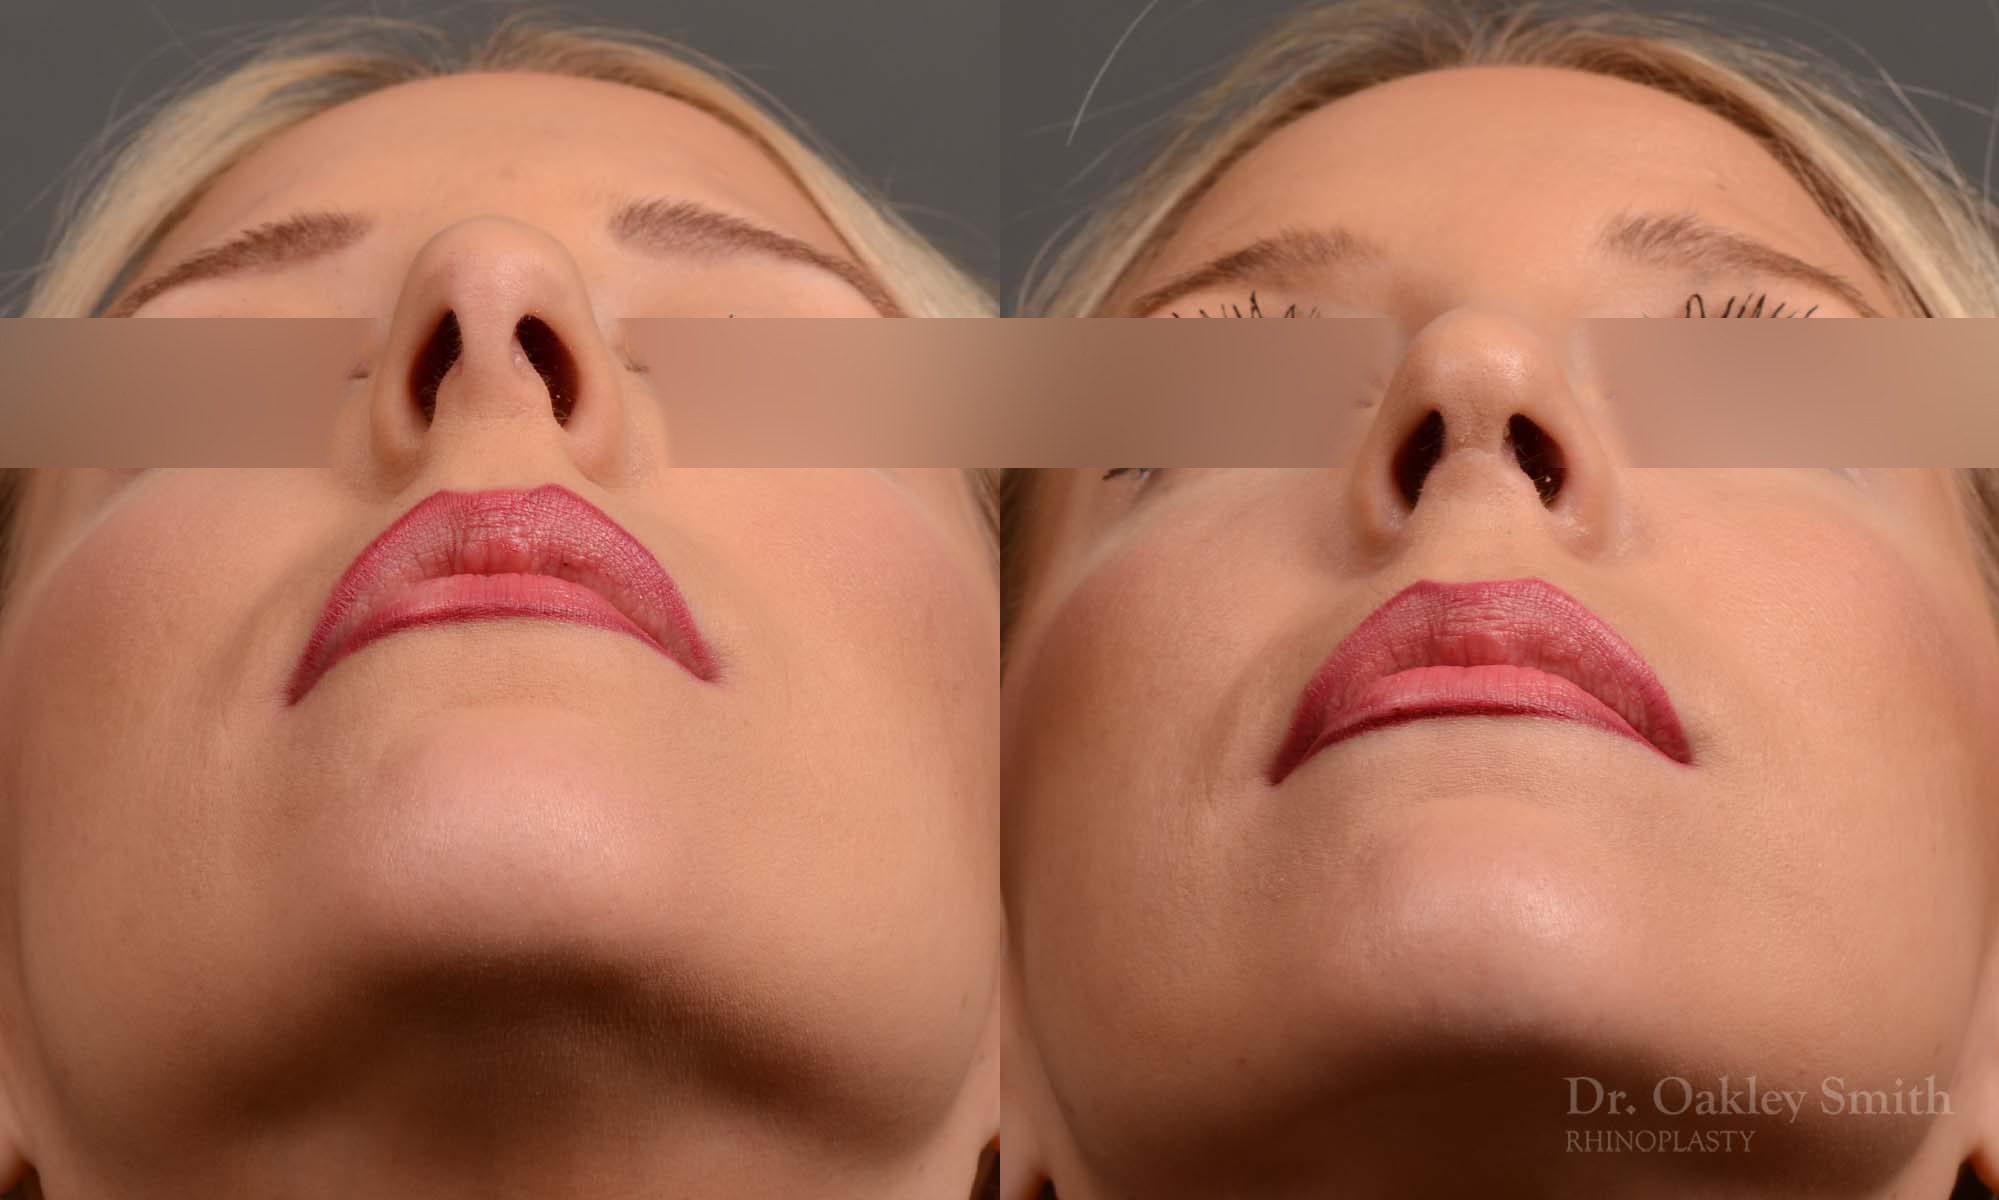 Hump reduction rhisnoplasty